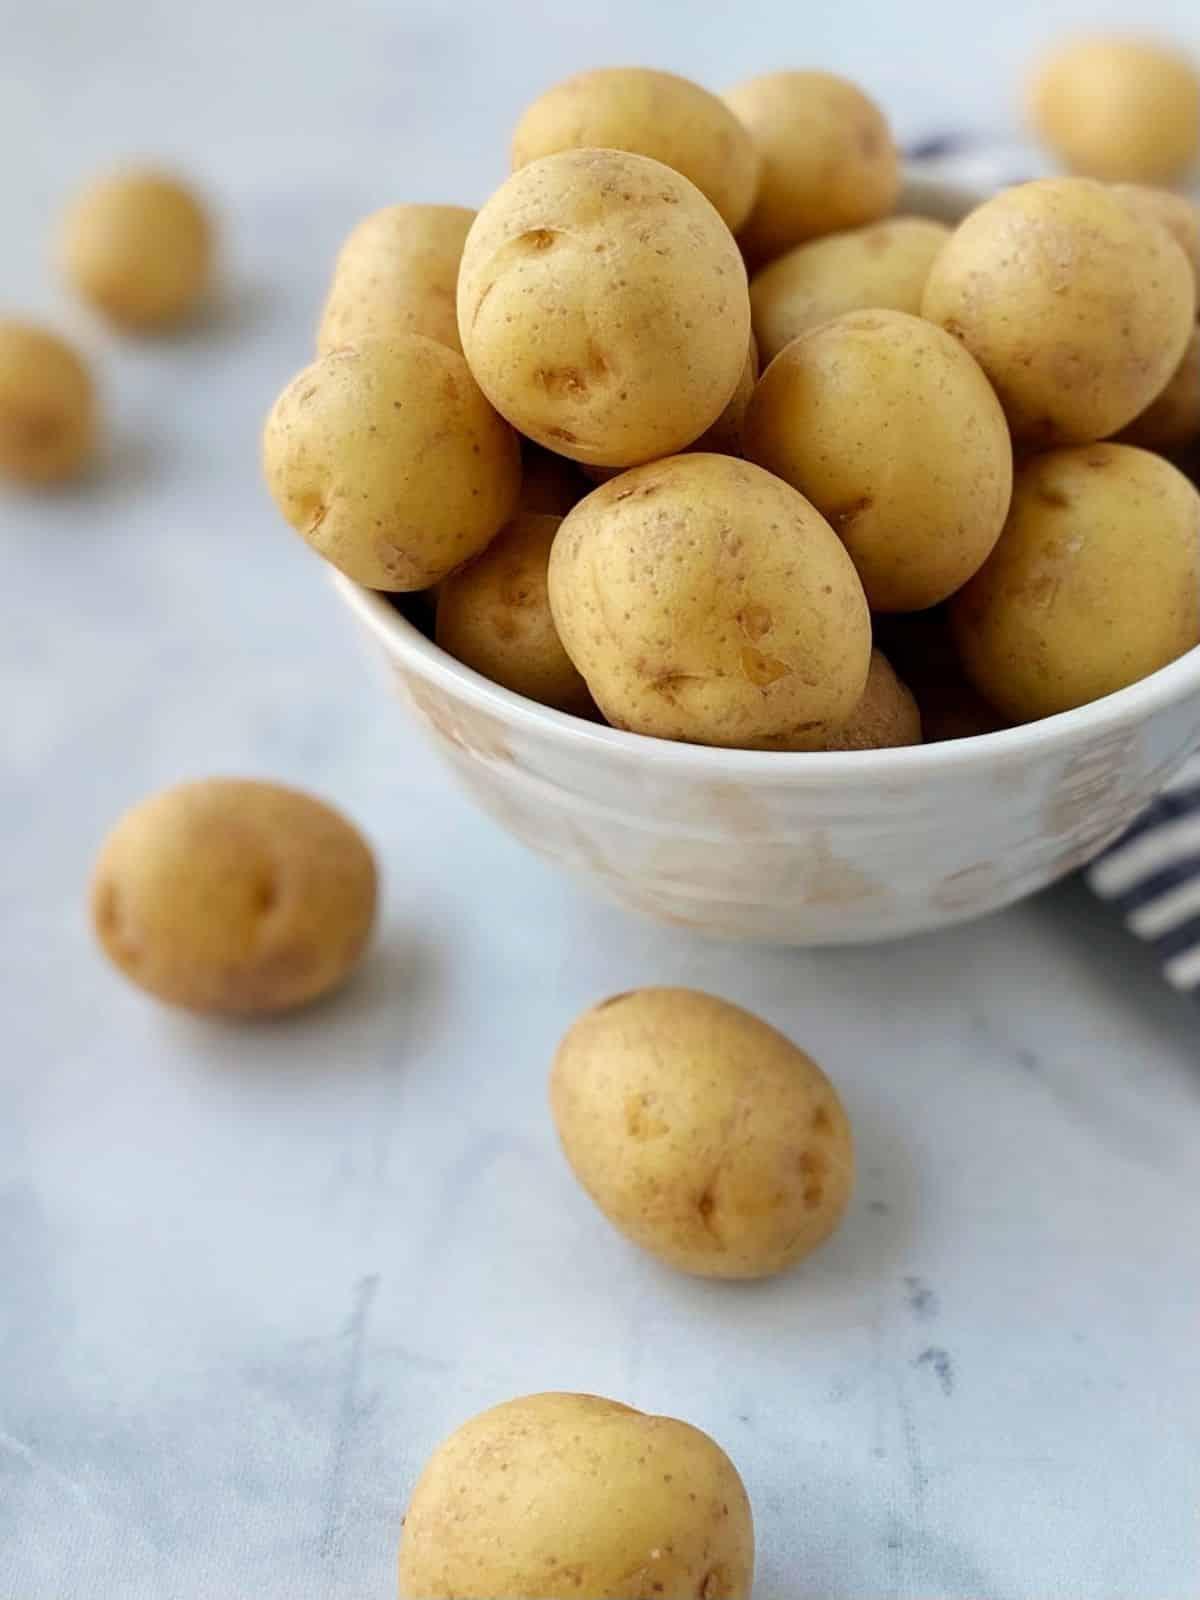 bowl of baby potatoes before roasting